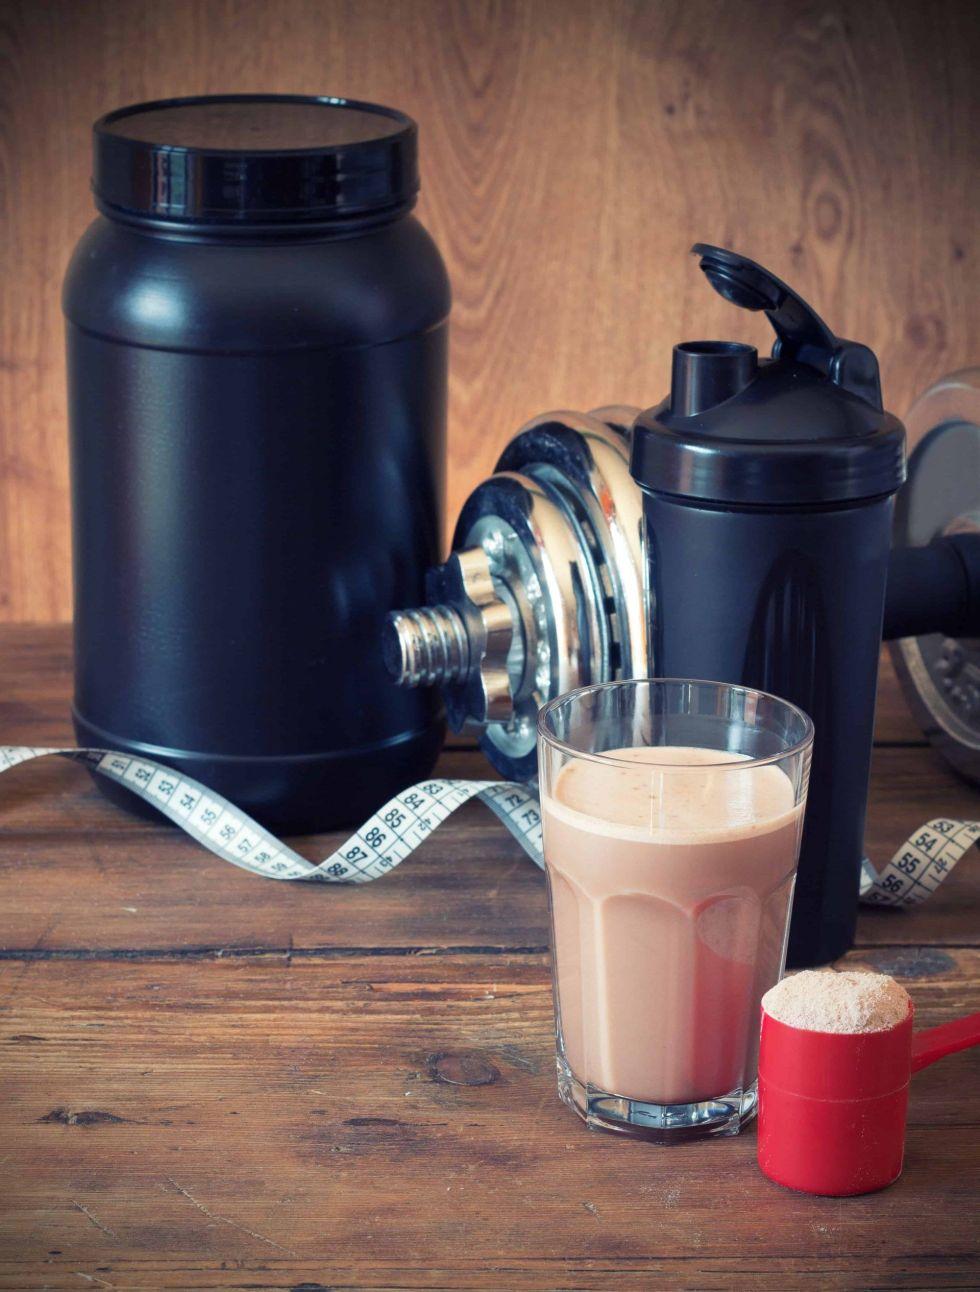 Protein shake next to a protein shake blender